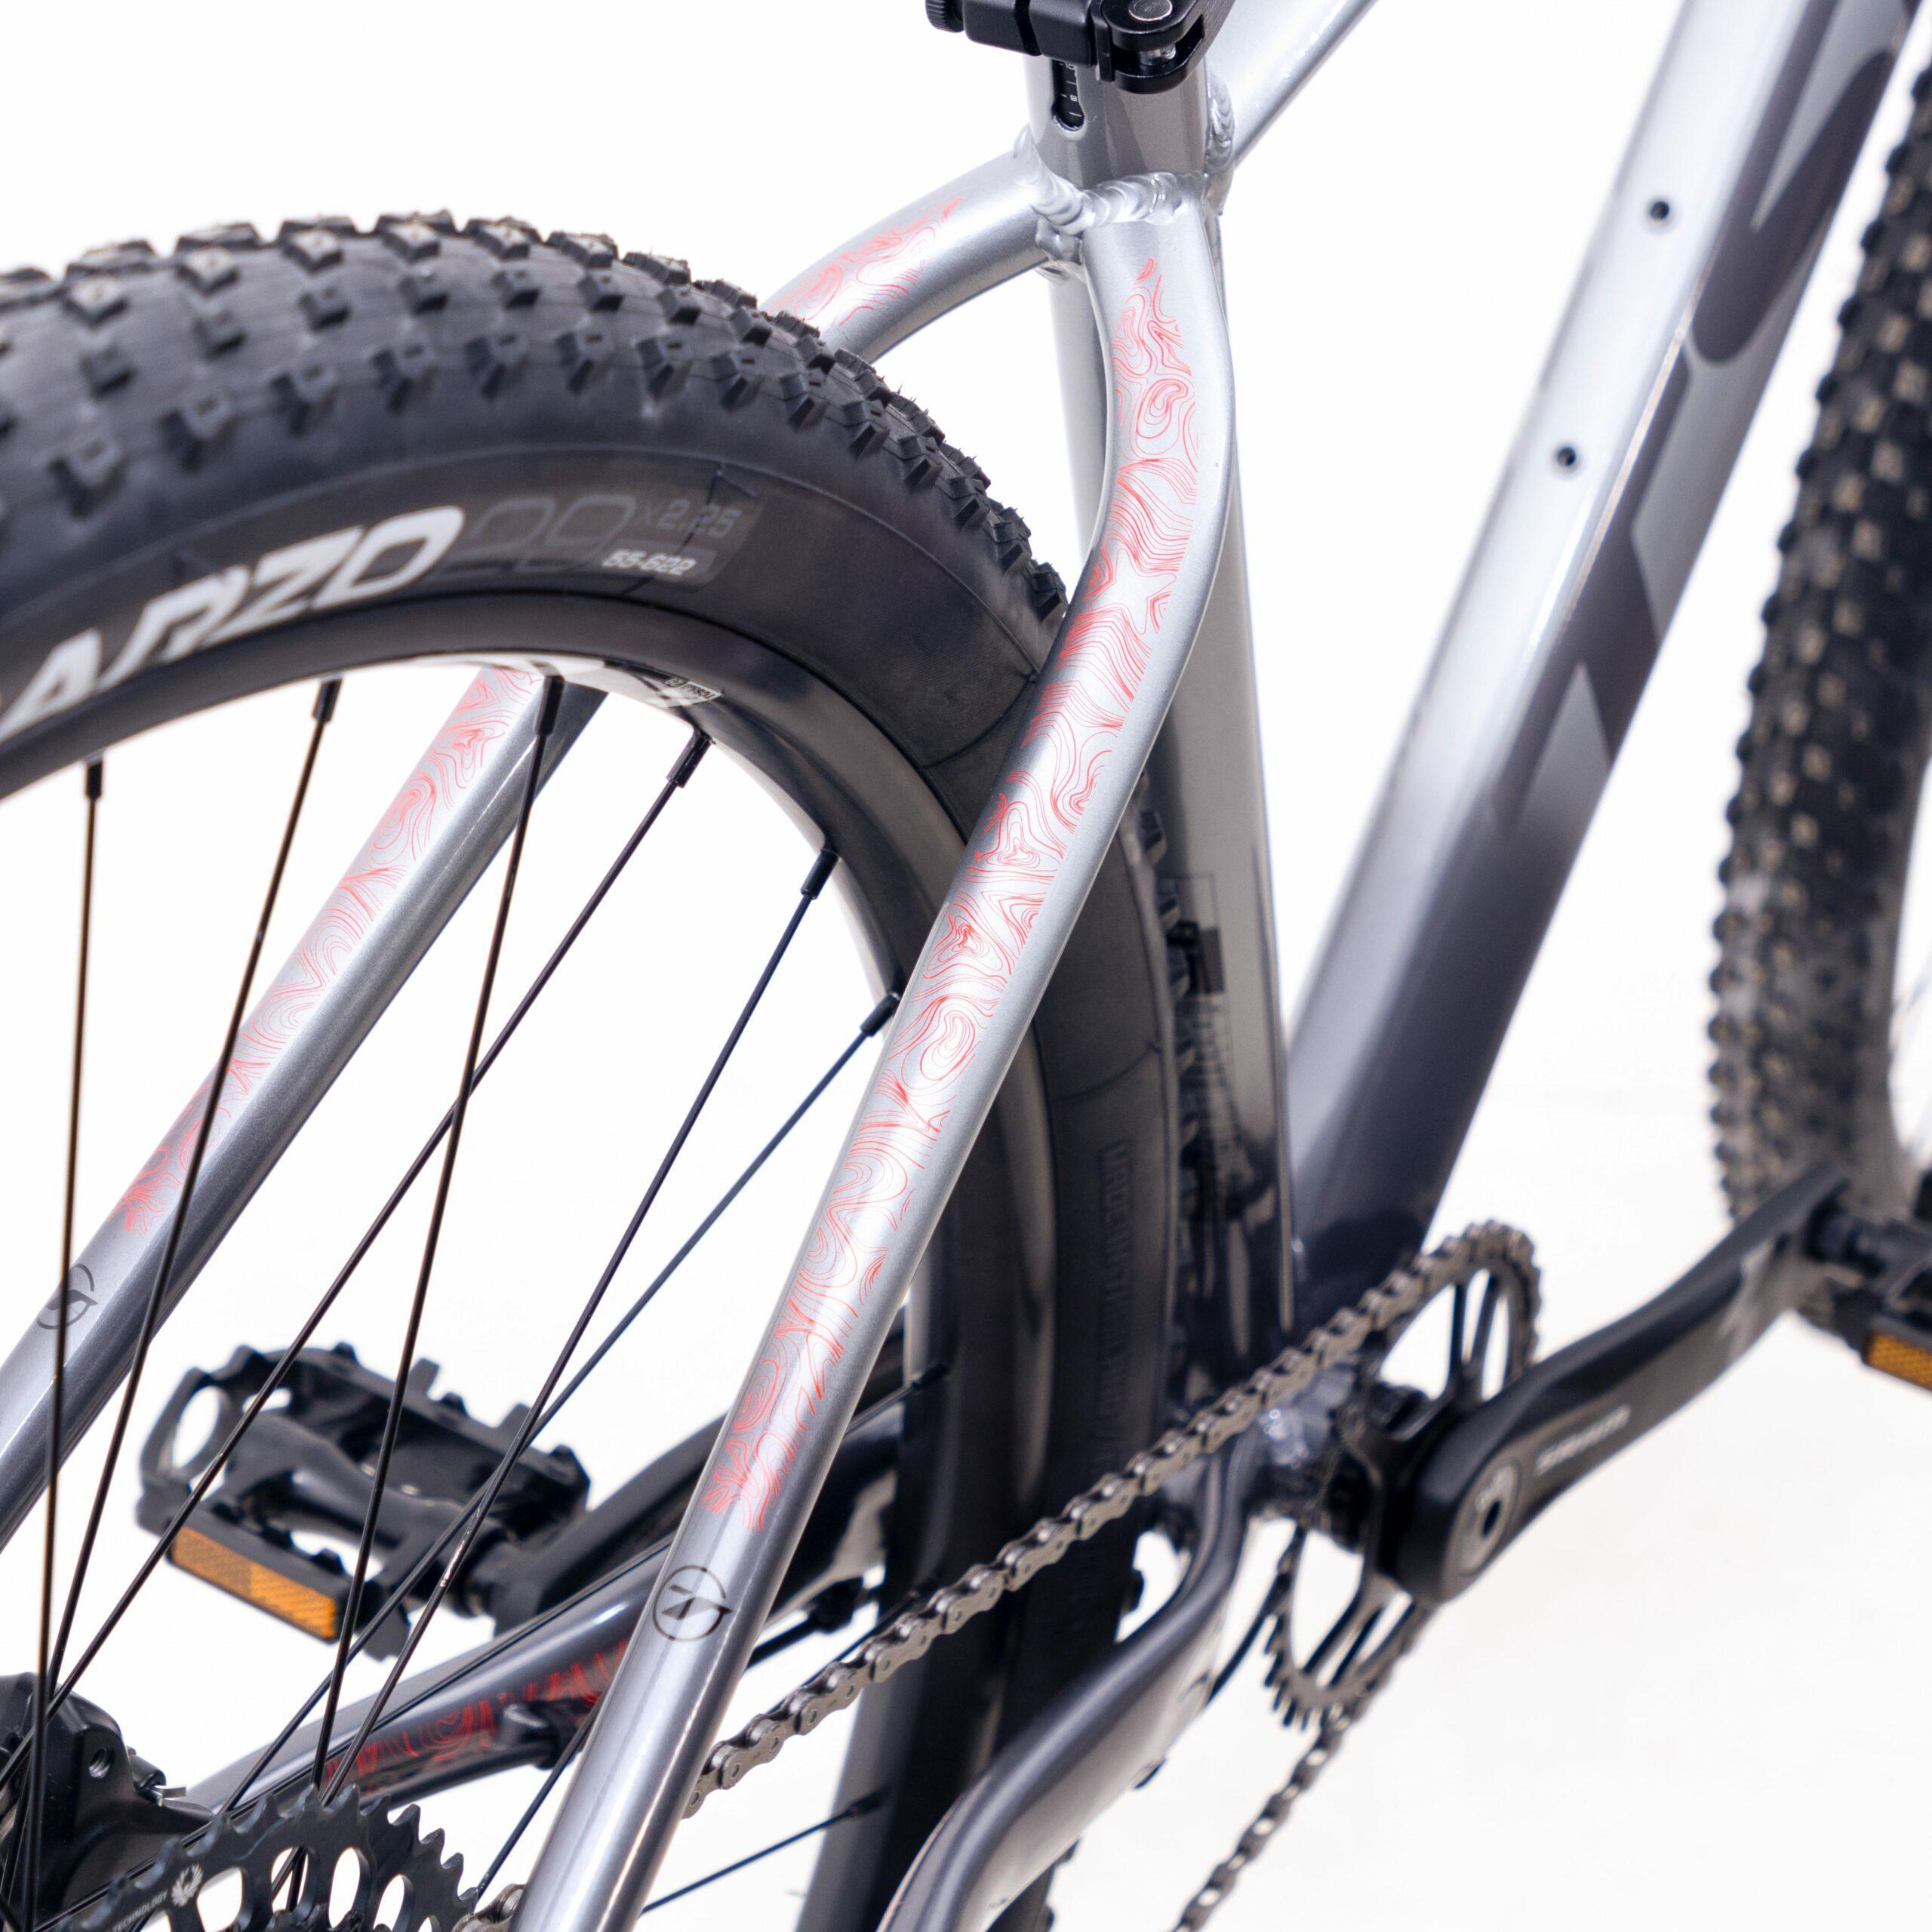 Bicicleta TSW Yukon | GX-SM | 2021/2022 15